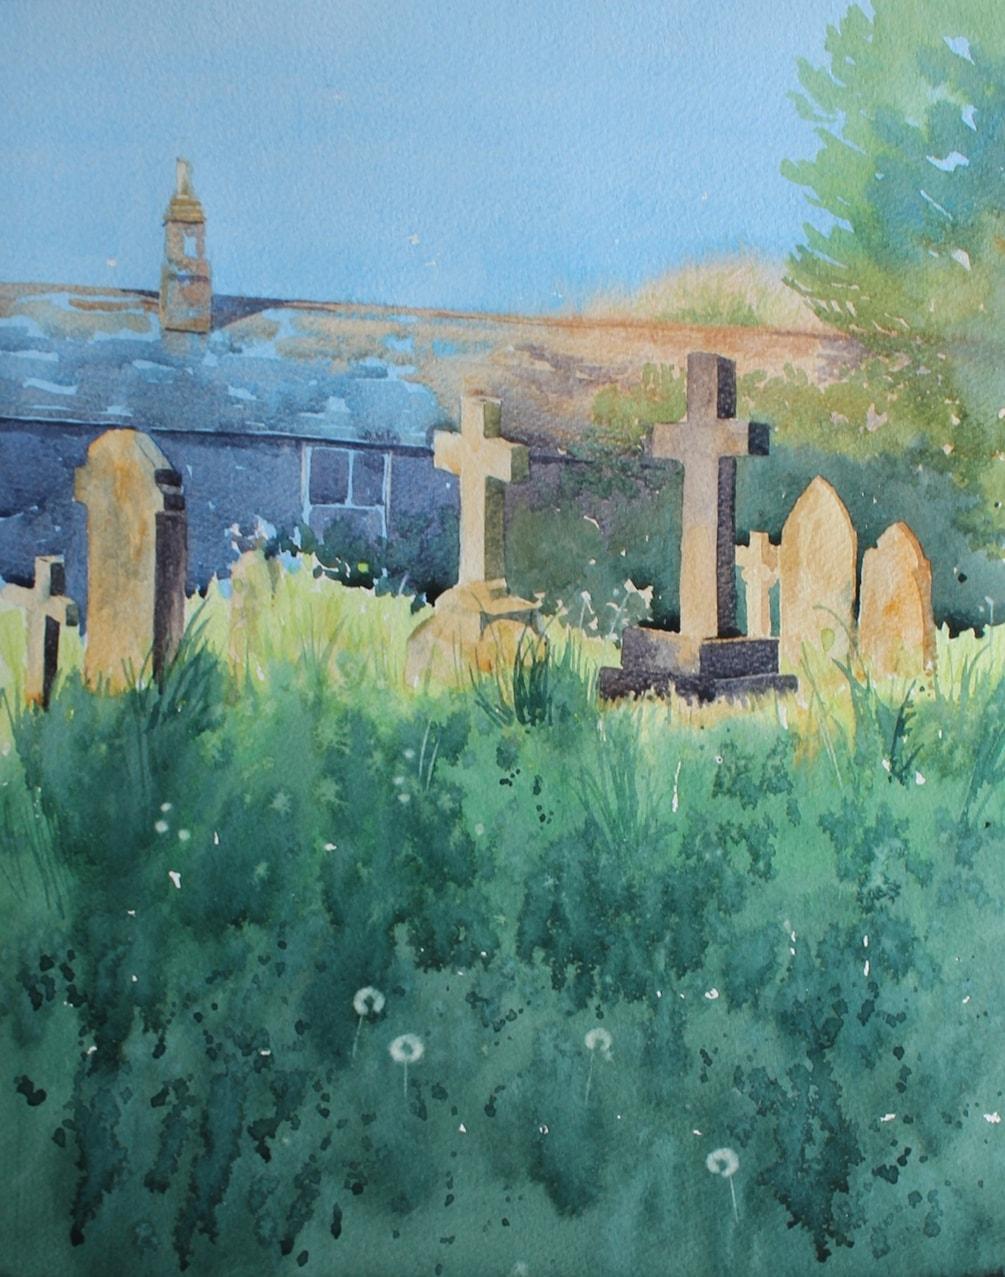 Sundown over the graveyard